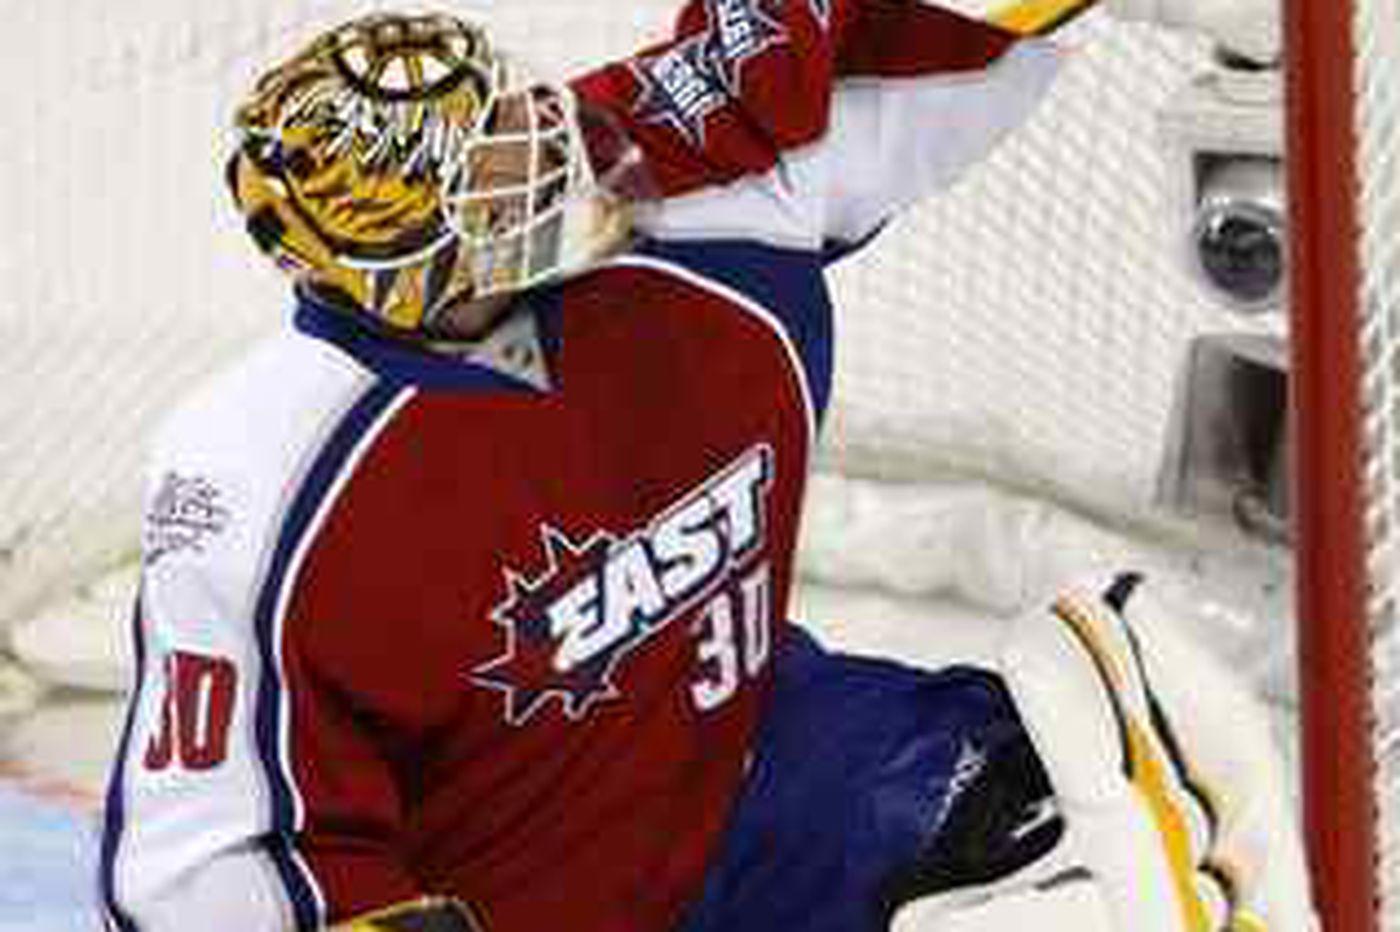 Flyers' Carter enjoys All-Star festivities